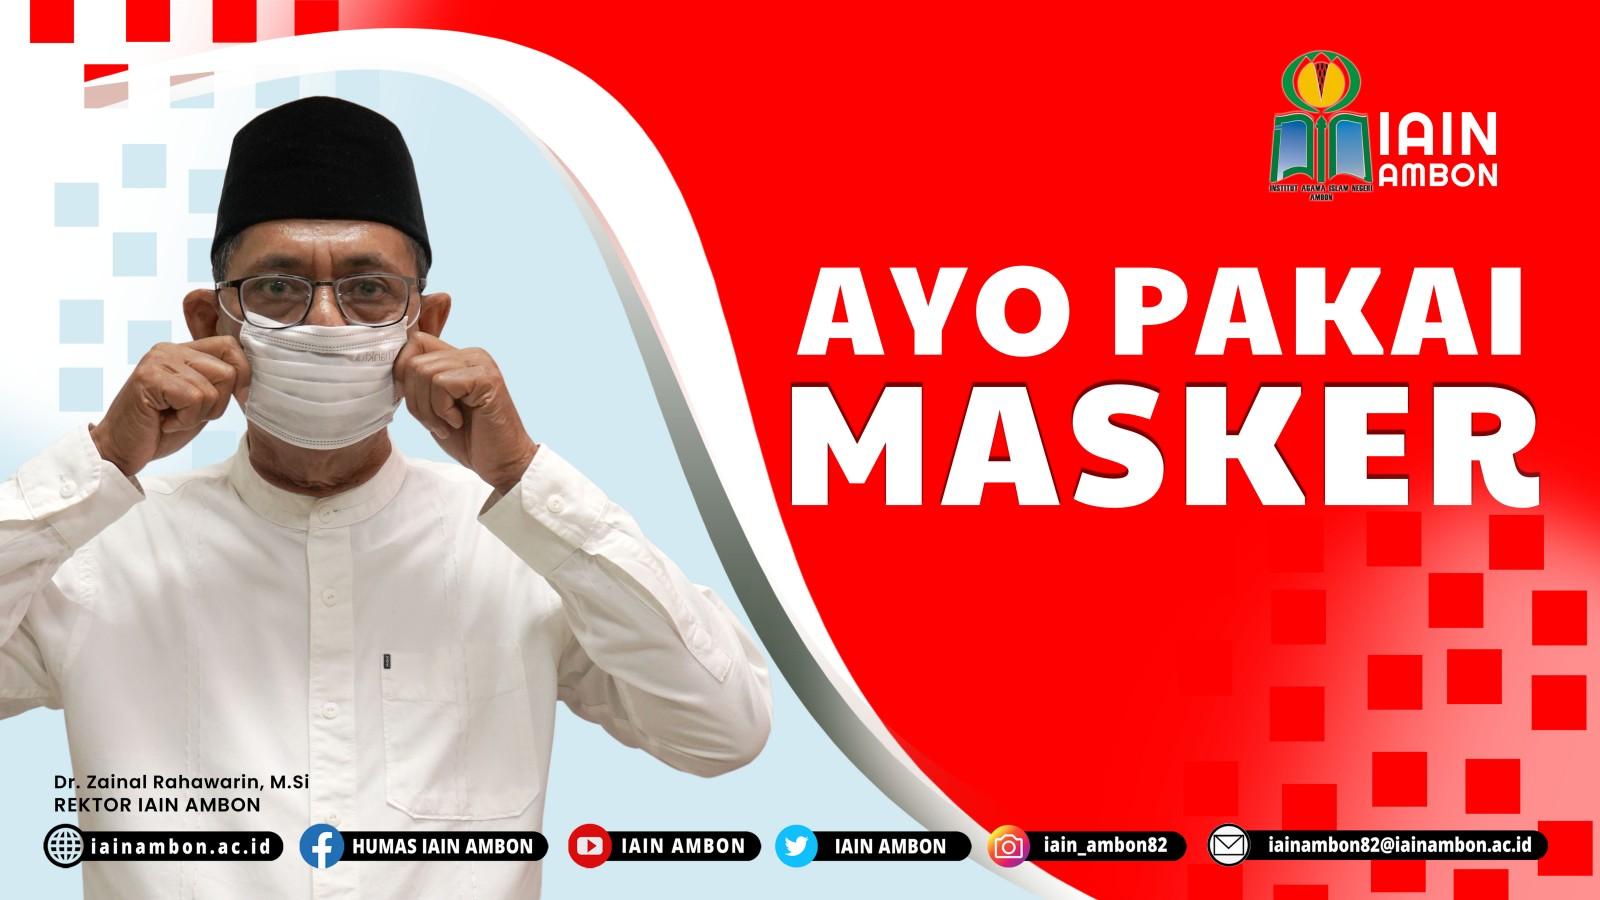 ayo-pakai-masker-4659f2026d-52530cebbaa8294abea1314f73c0cc9a